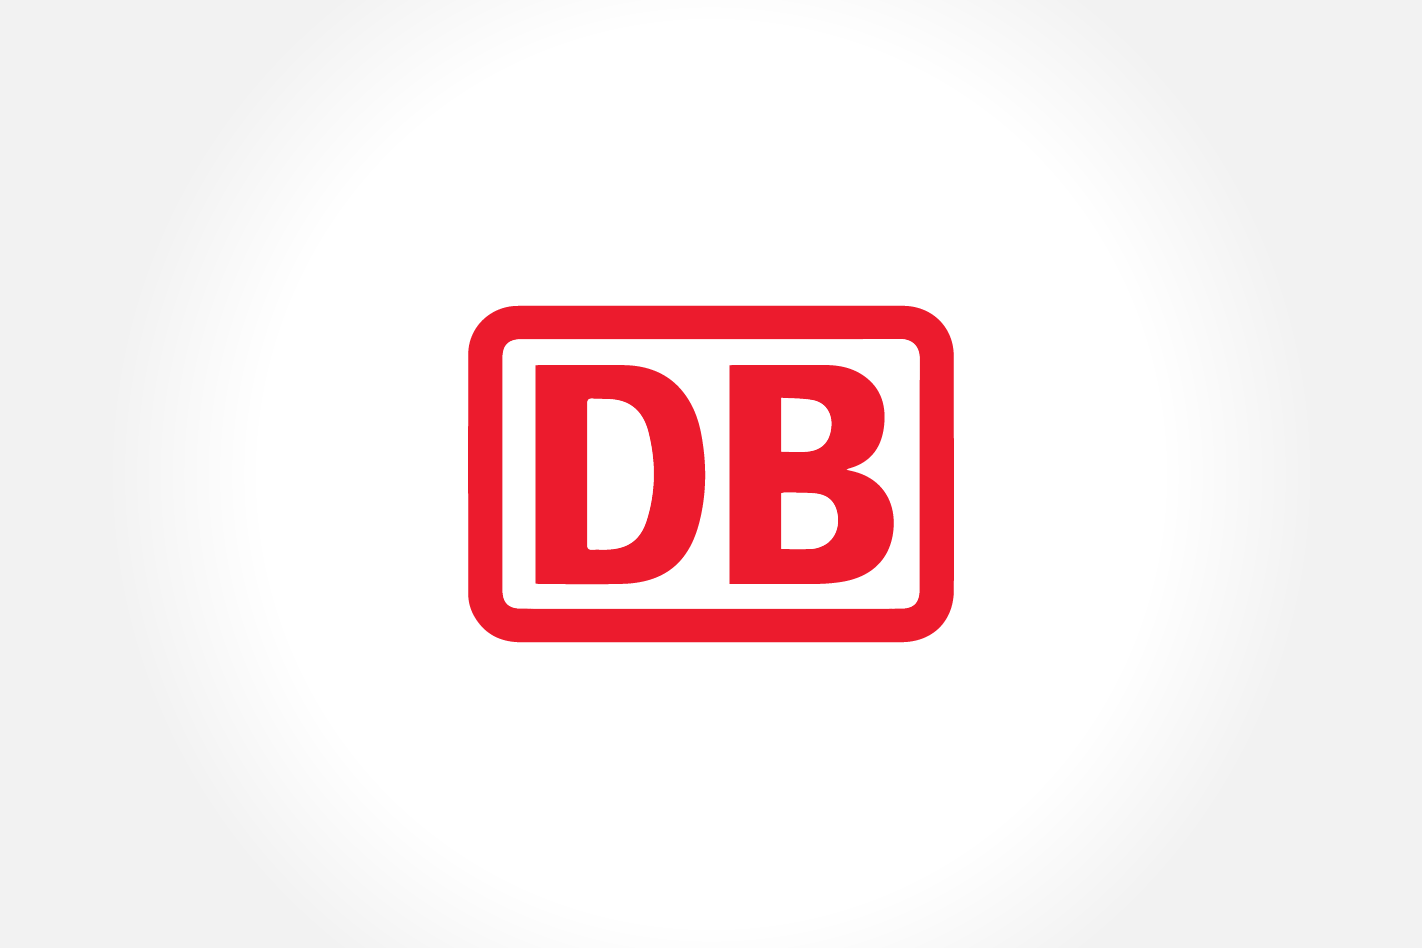 Fahrkartenautomat der Deutschen Bahn